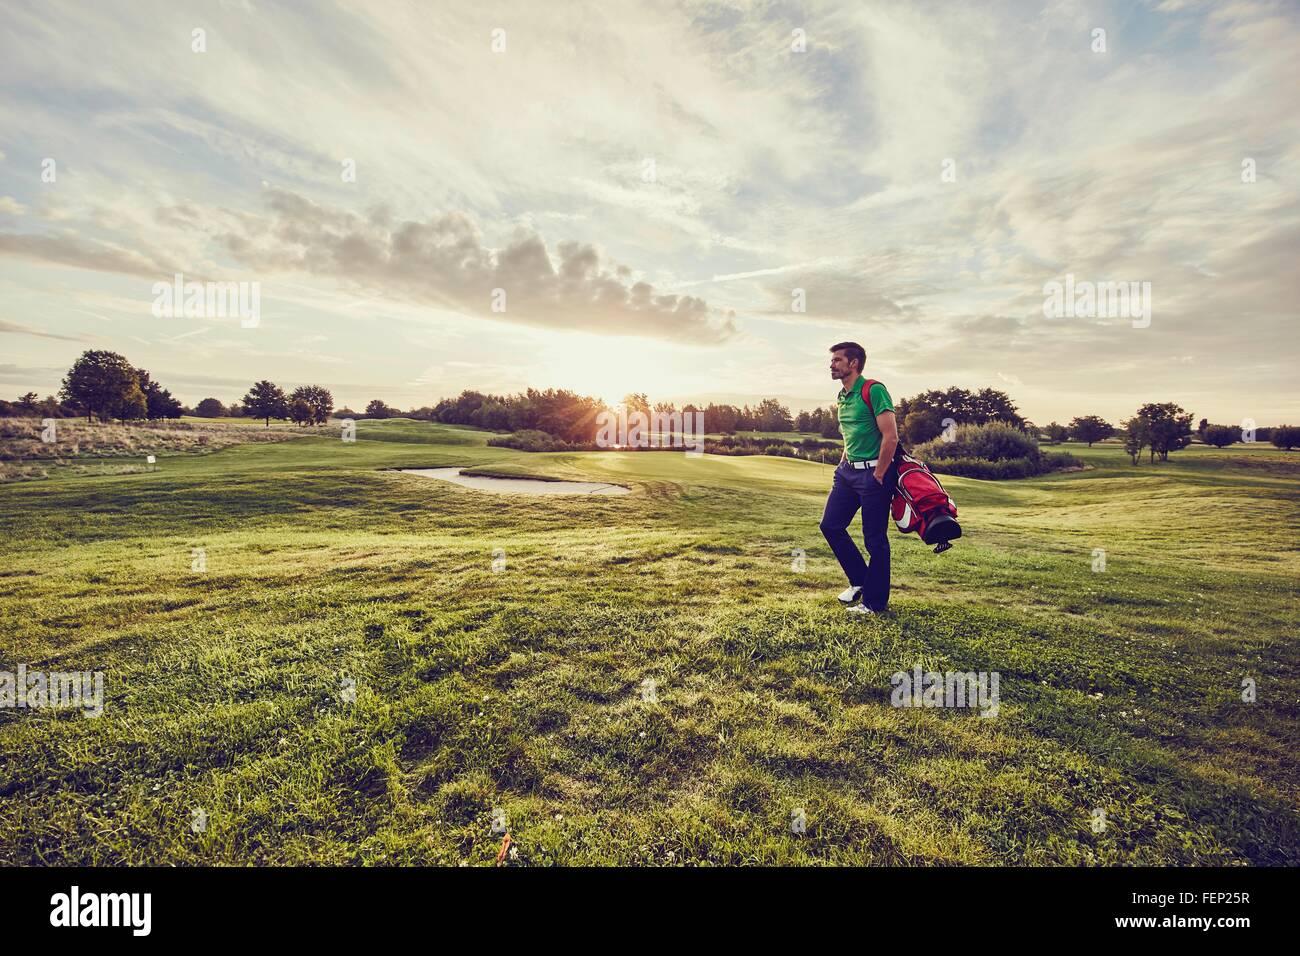 Golfer walking on course, Korschenbroich, Dusseldorf, Germany - Stock Image